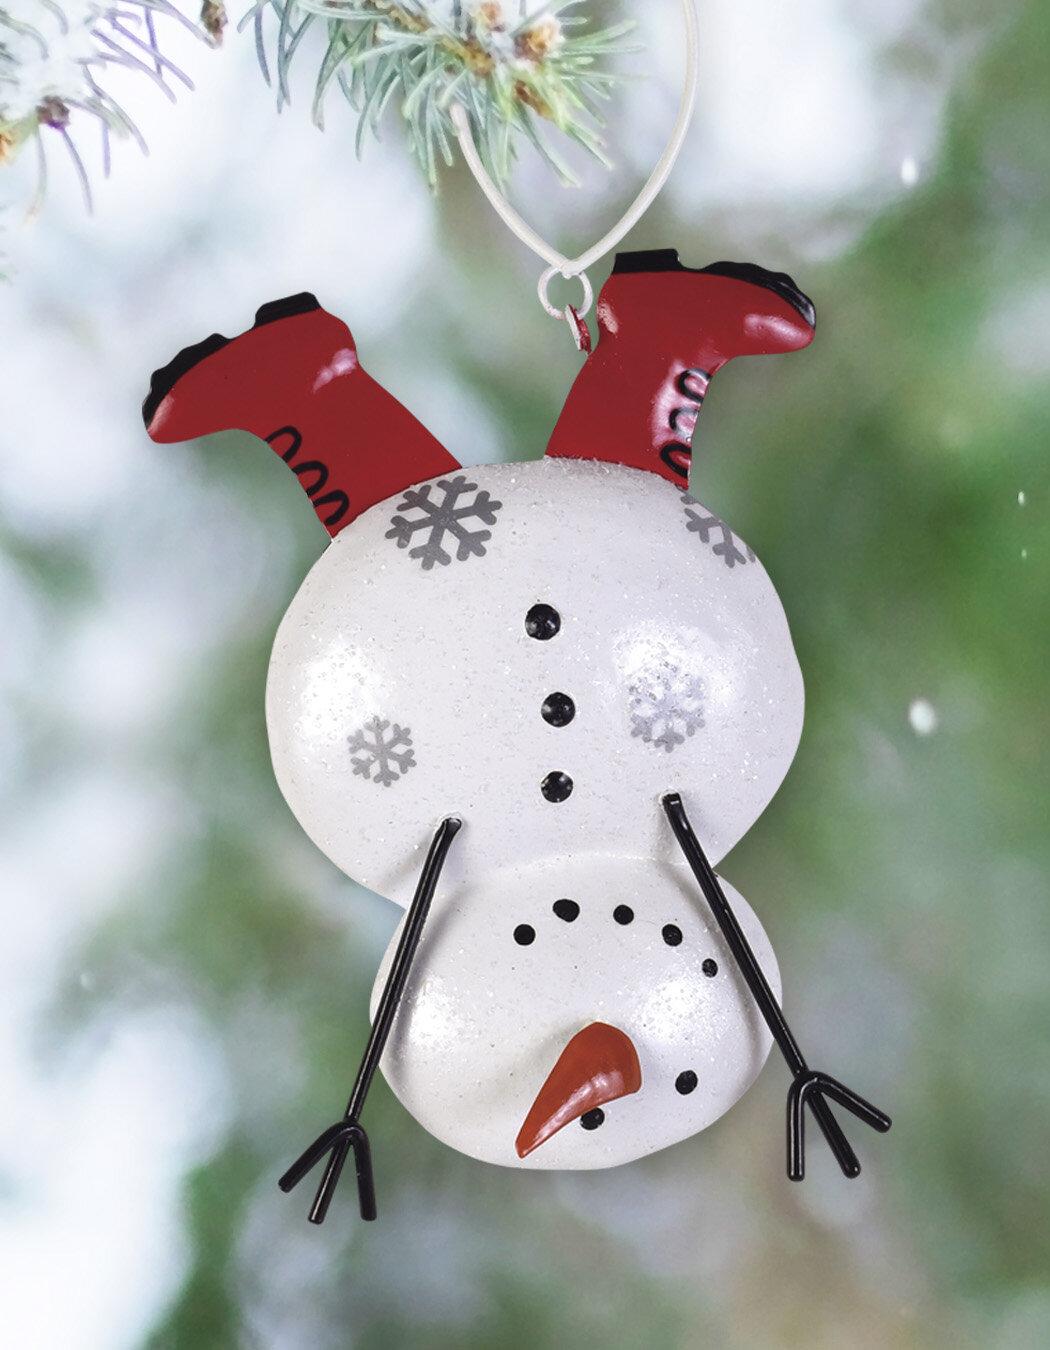 The Holiday Aisle Set Of 2 Upside Down Snowman Hanging Figurine Ornament Wayfair